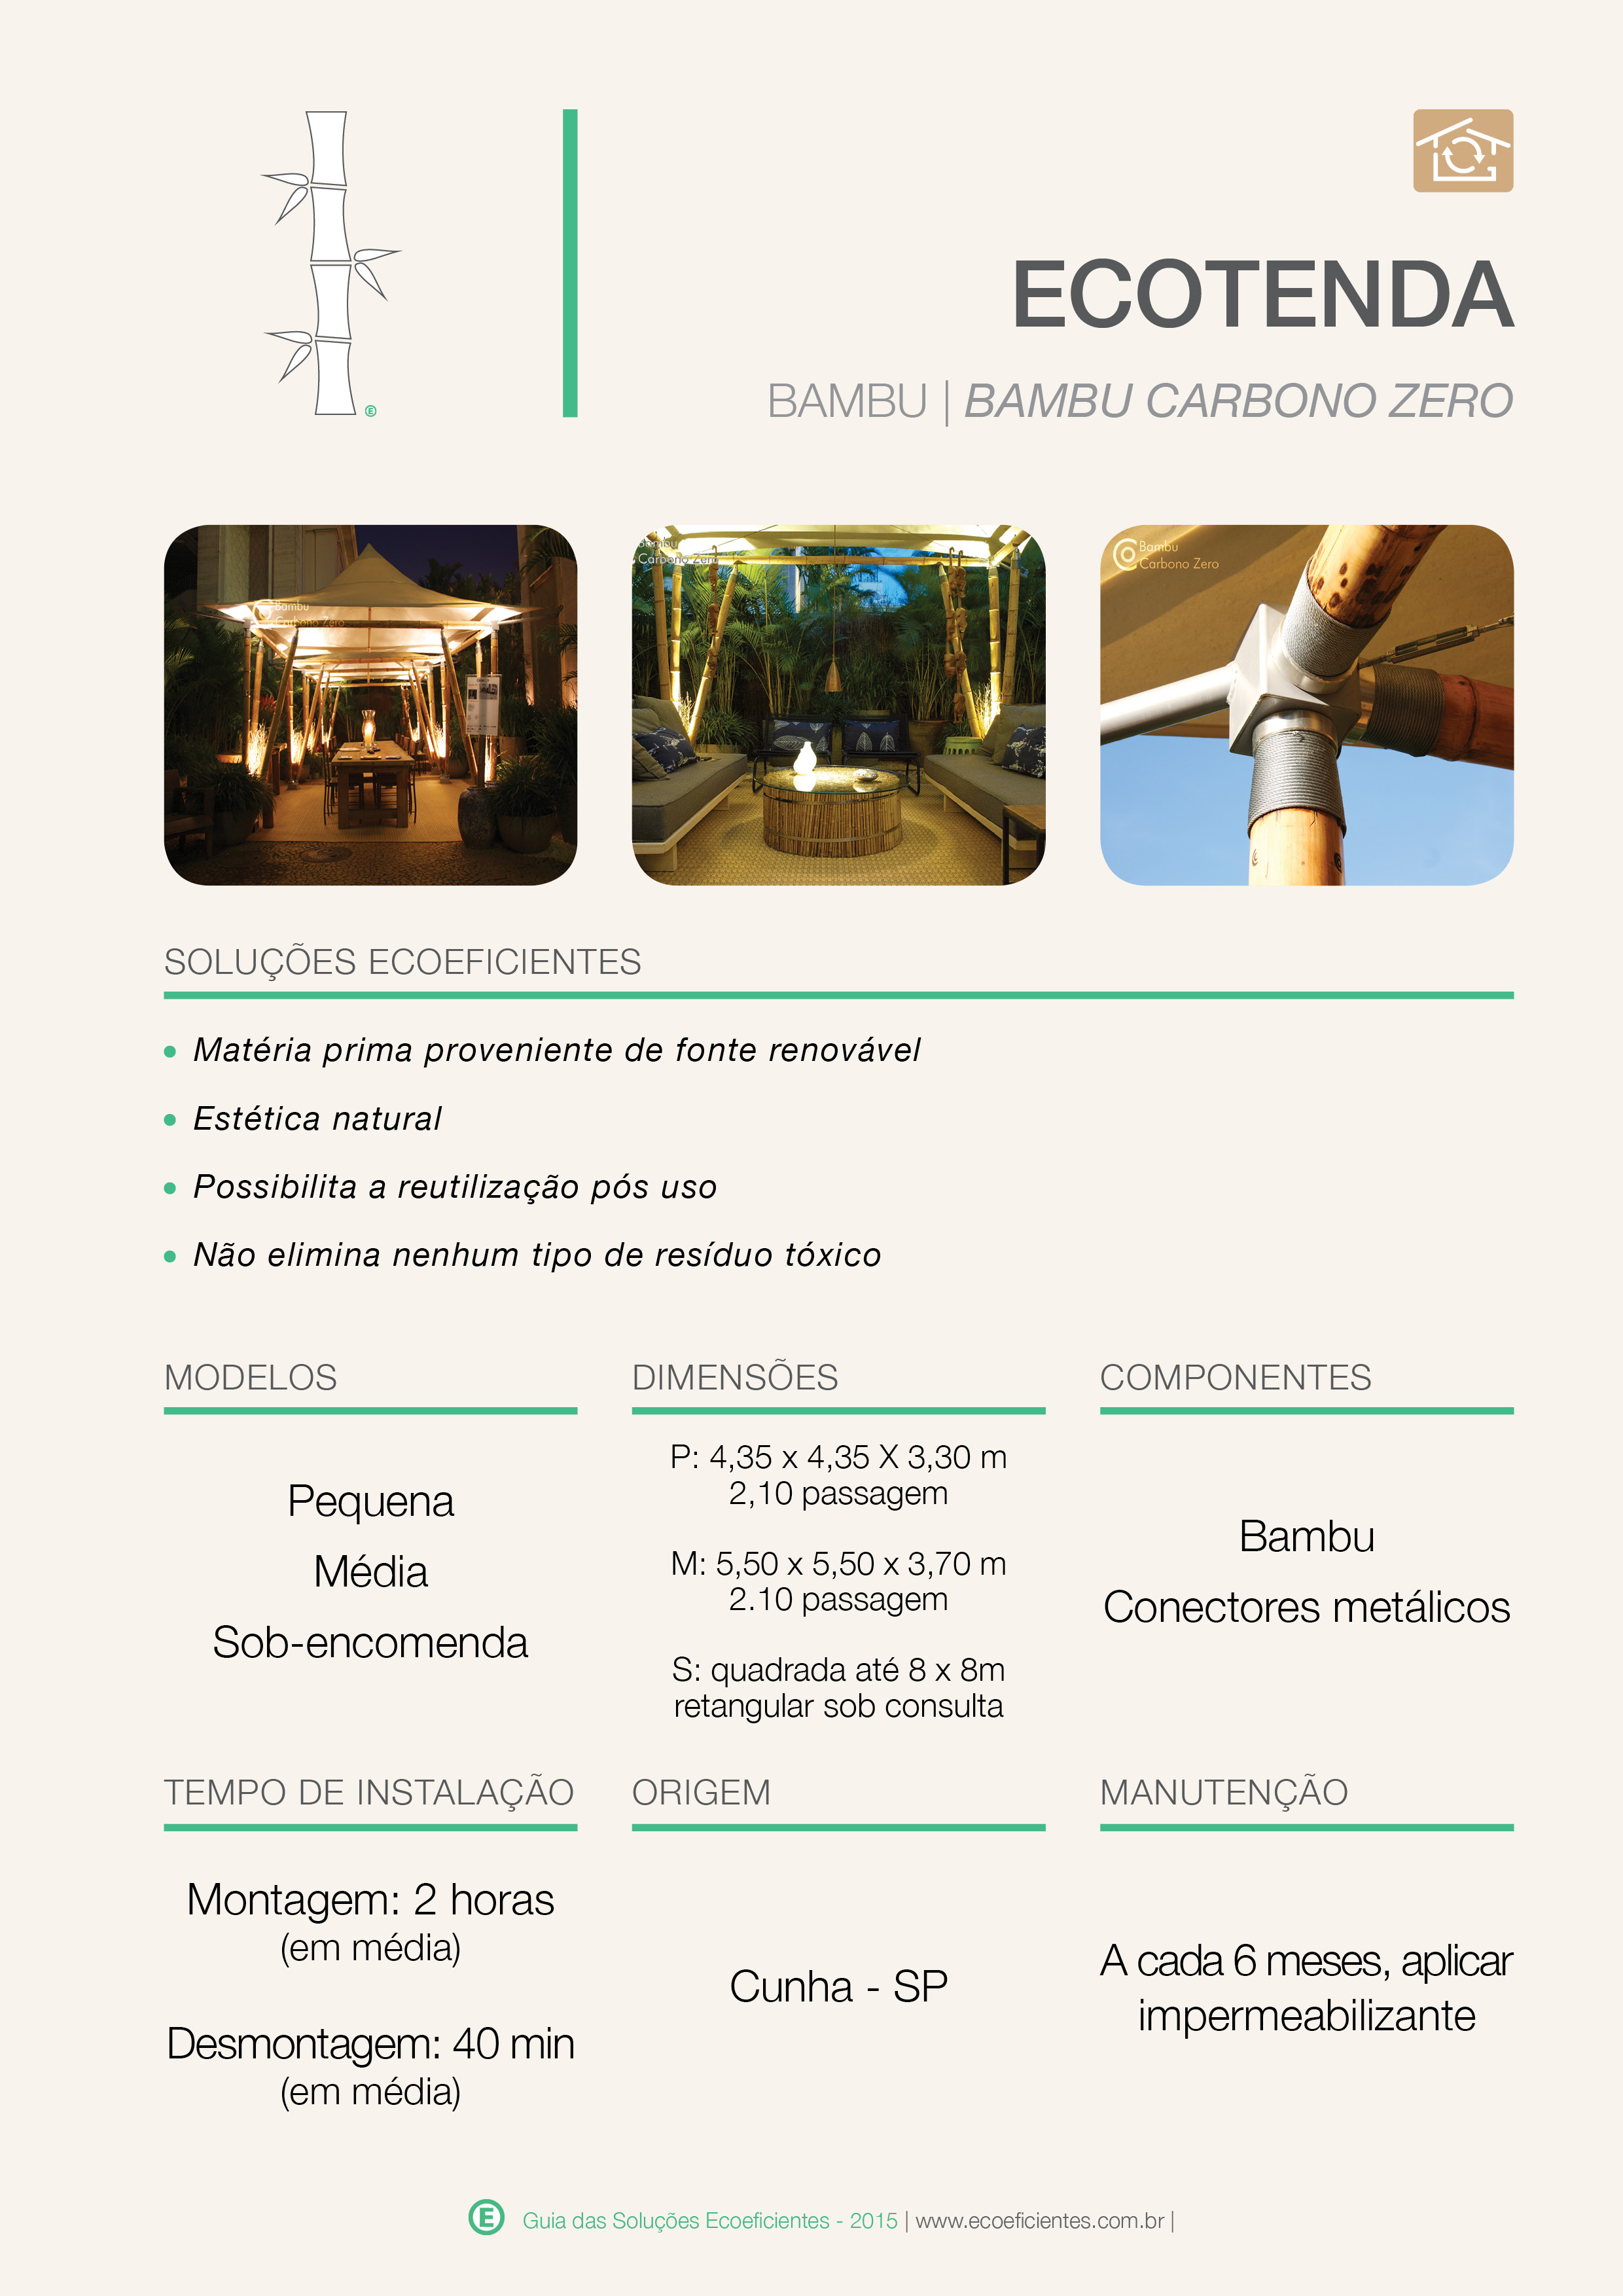 ecotenda-bambu-bambu-carbono-zero